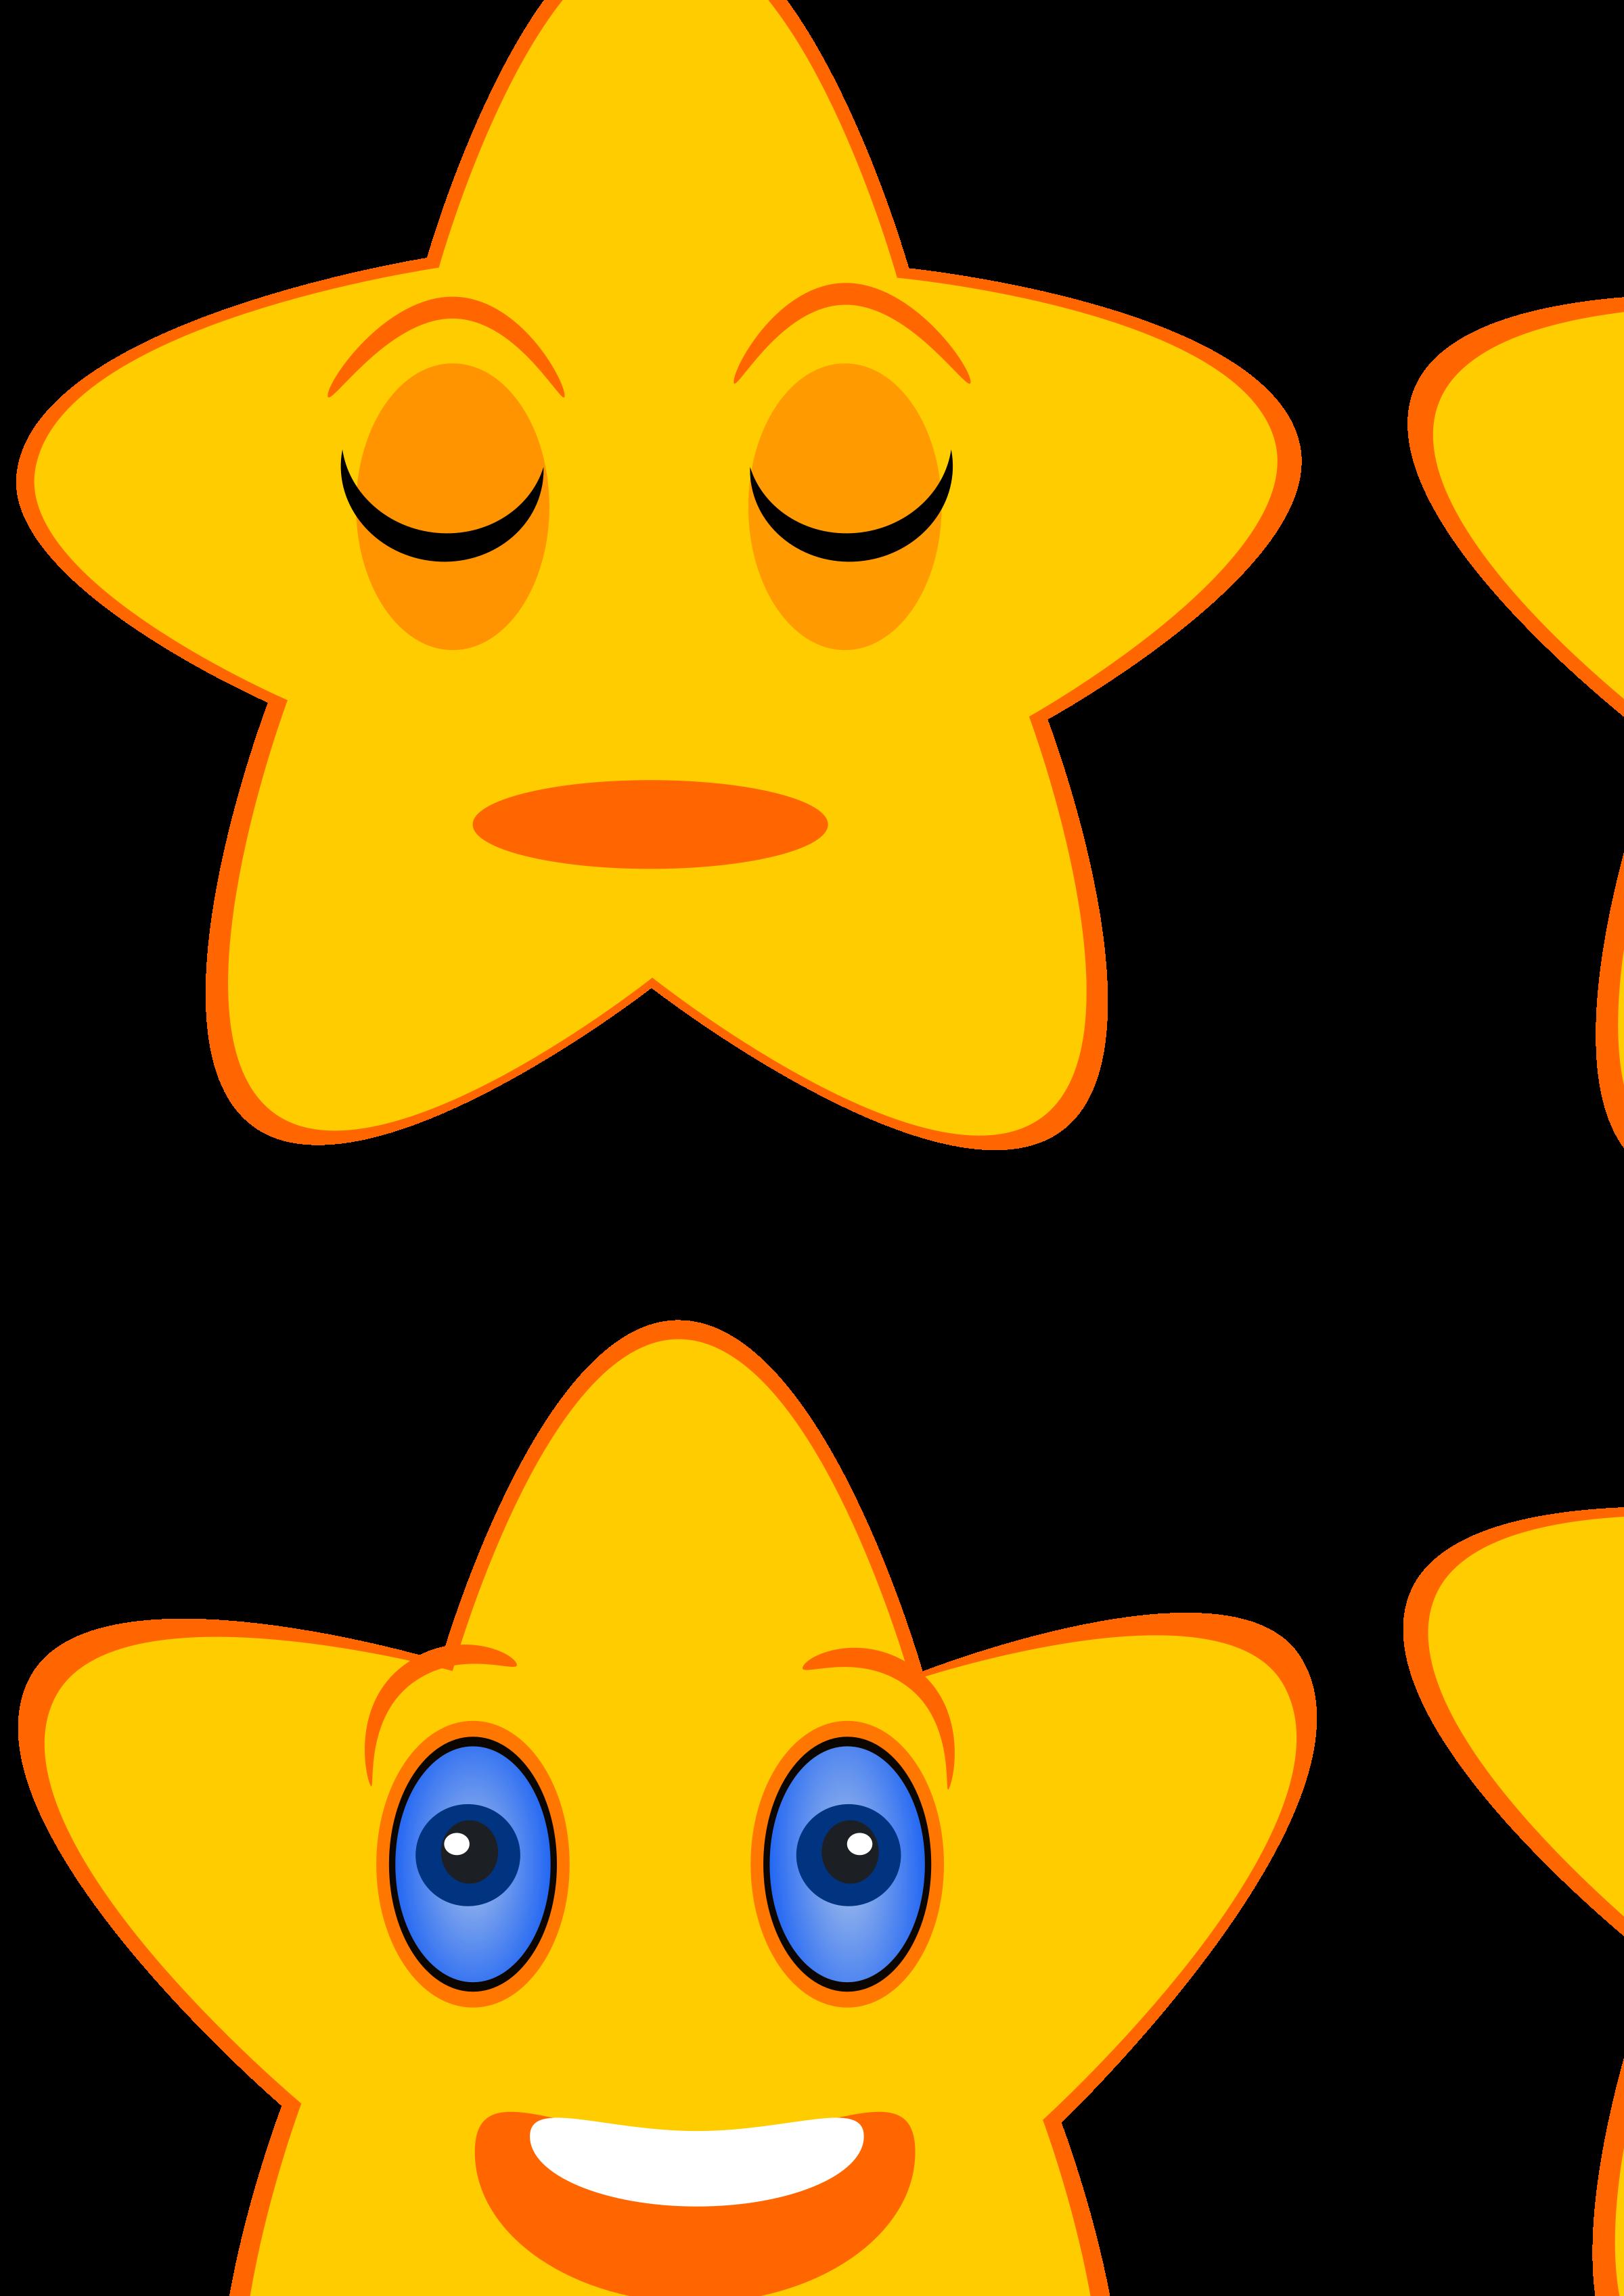 Photo clipart animated. Sleeping star big image